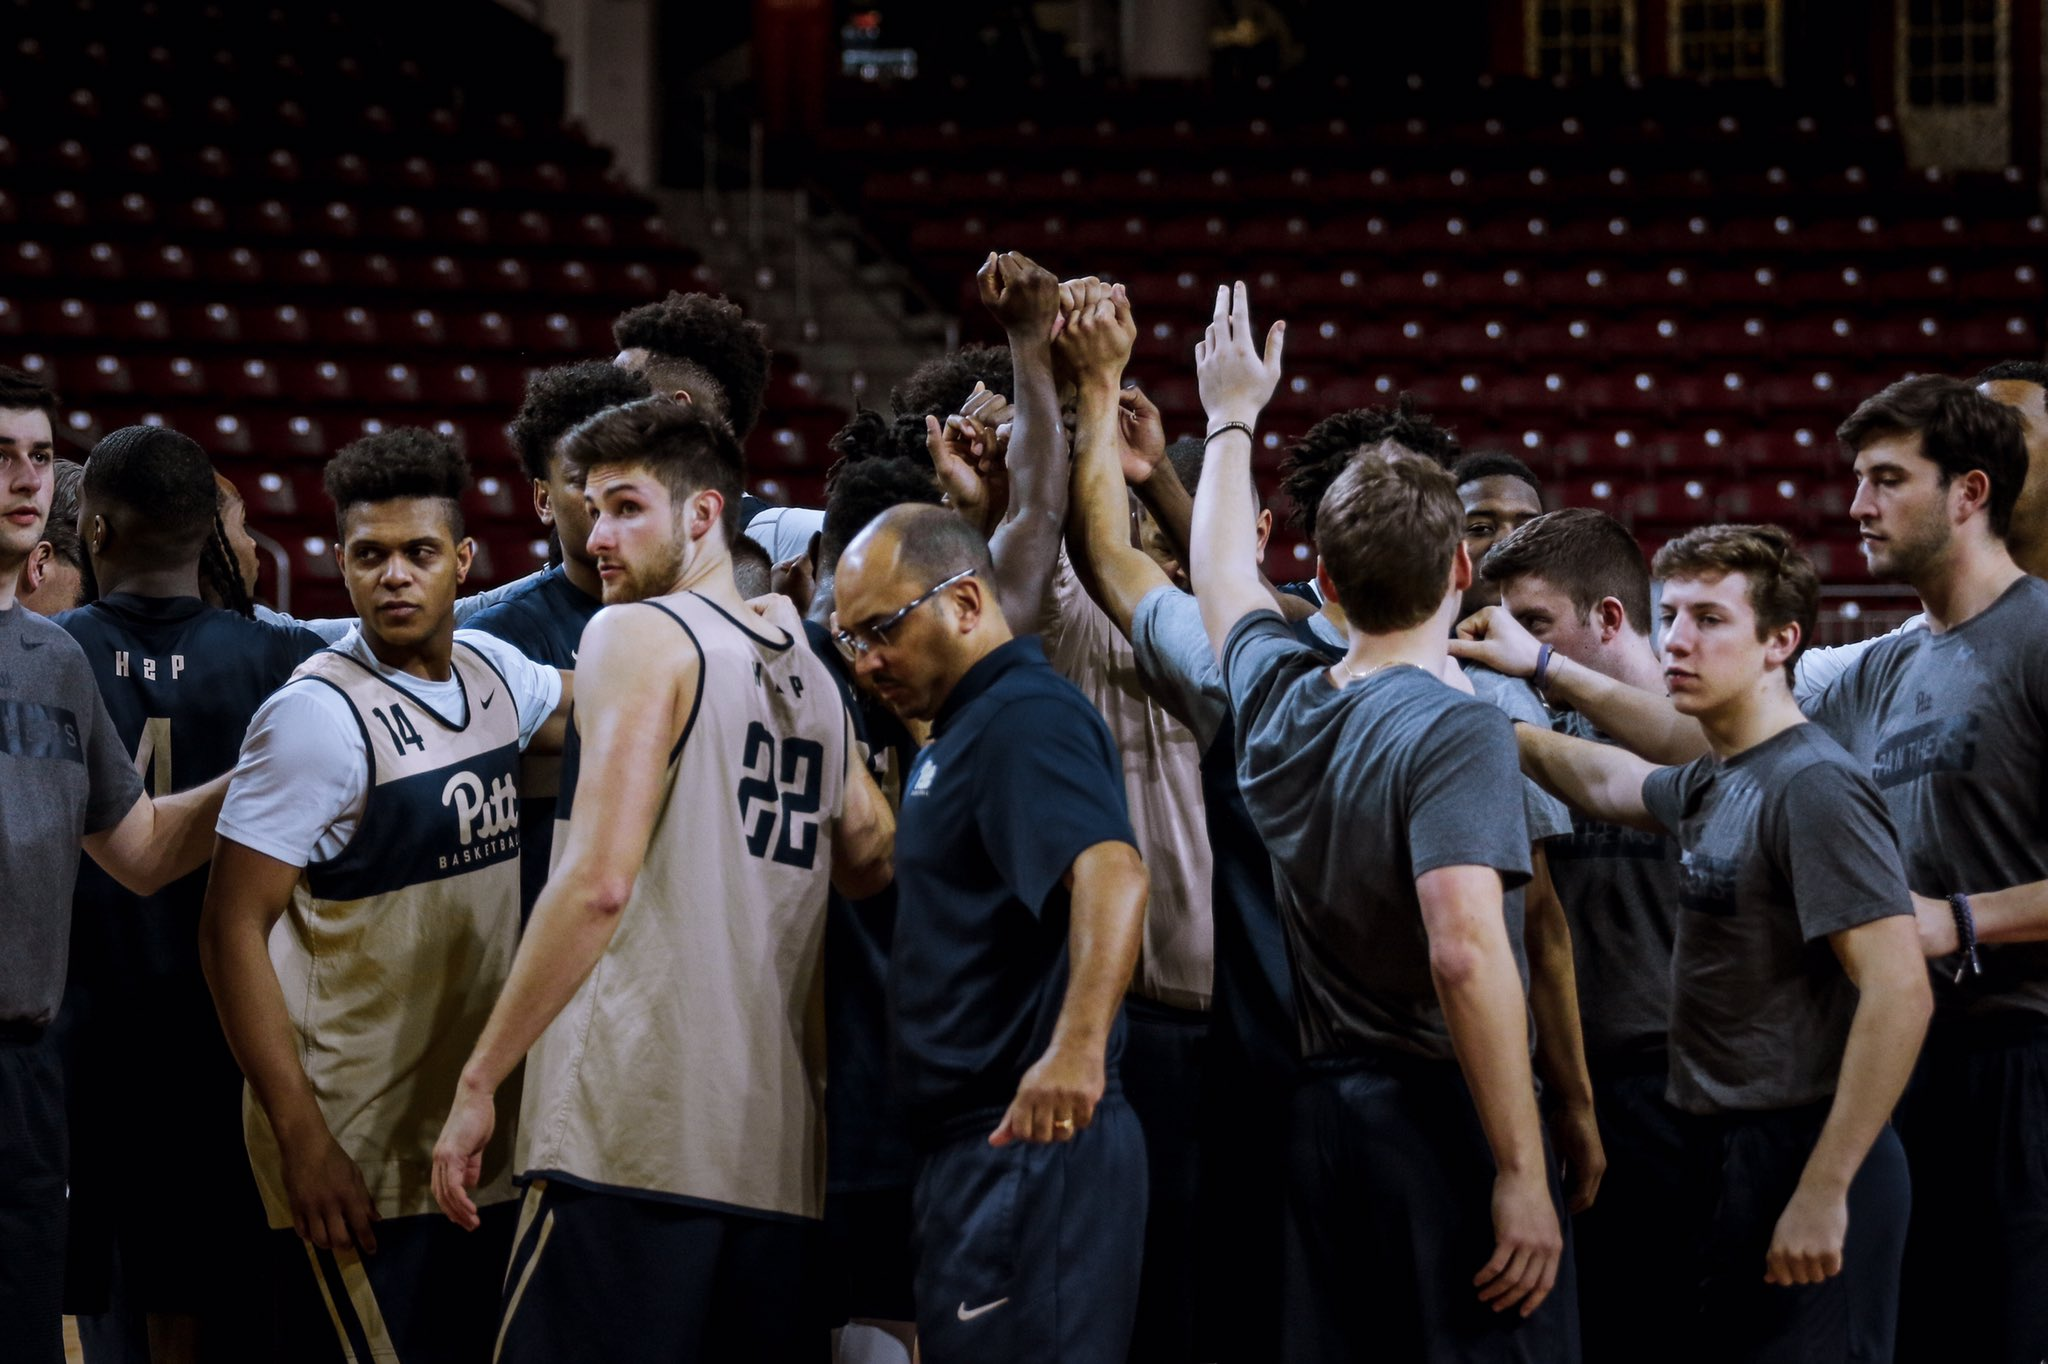 Pittsburgh Panthers NCAA Basketball: Set the scene.   #ZooEra | #H2P.  Tweet by @Pitt_MBB